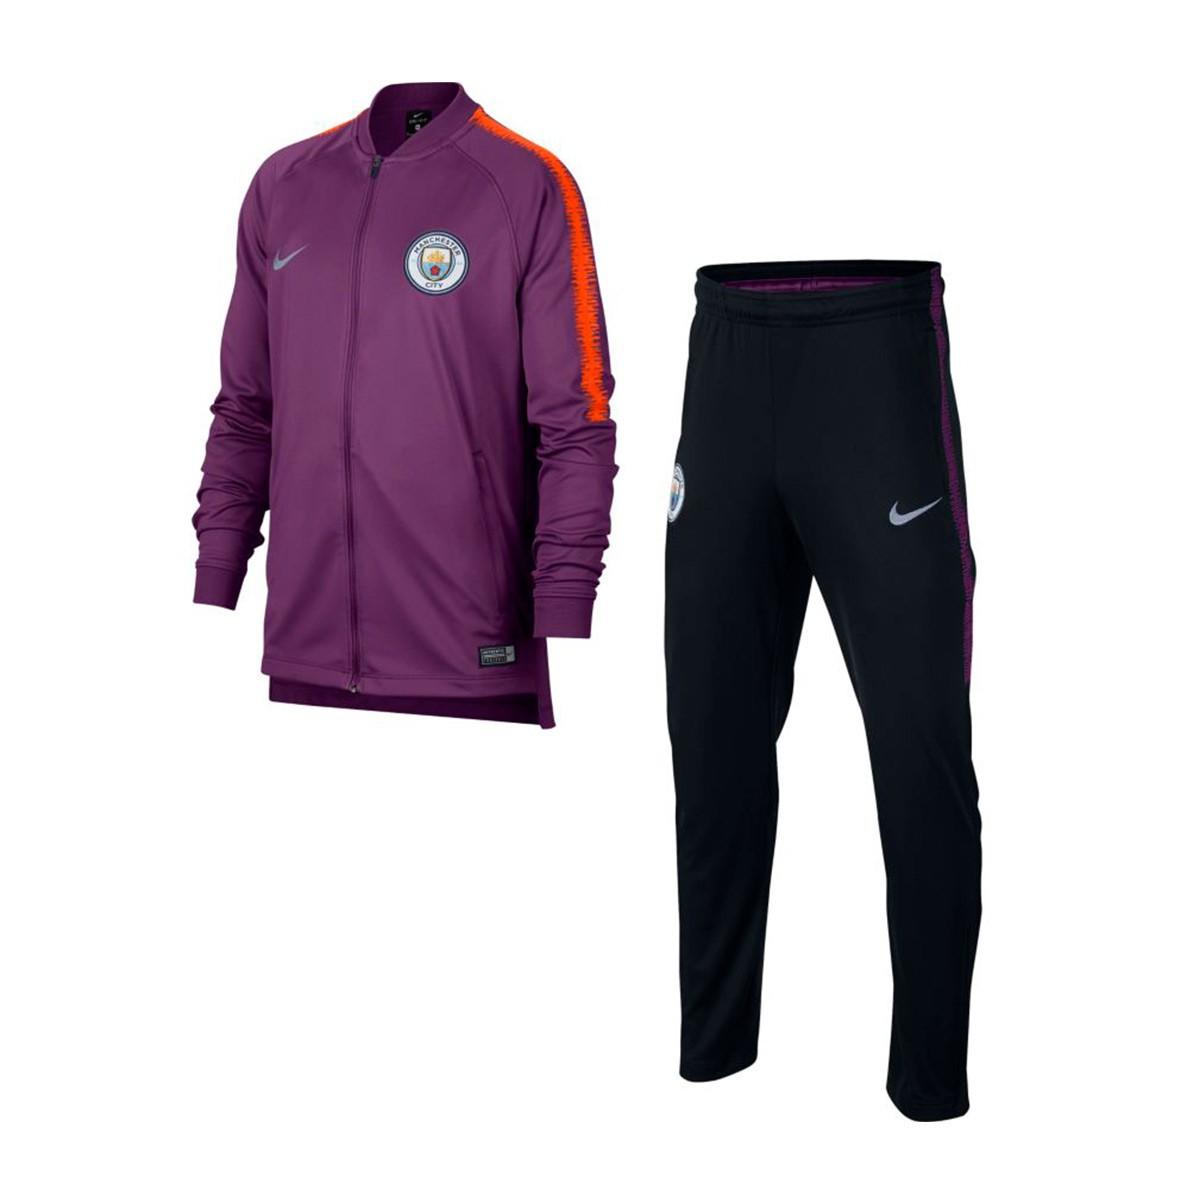 64e1bfc88 Tracksuit Nike Kids Manchester City FC Squad 2018-2019 Night purple ...